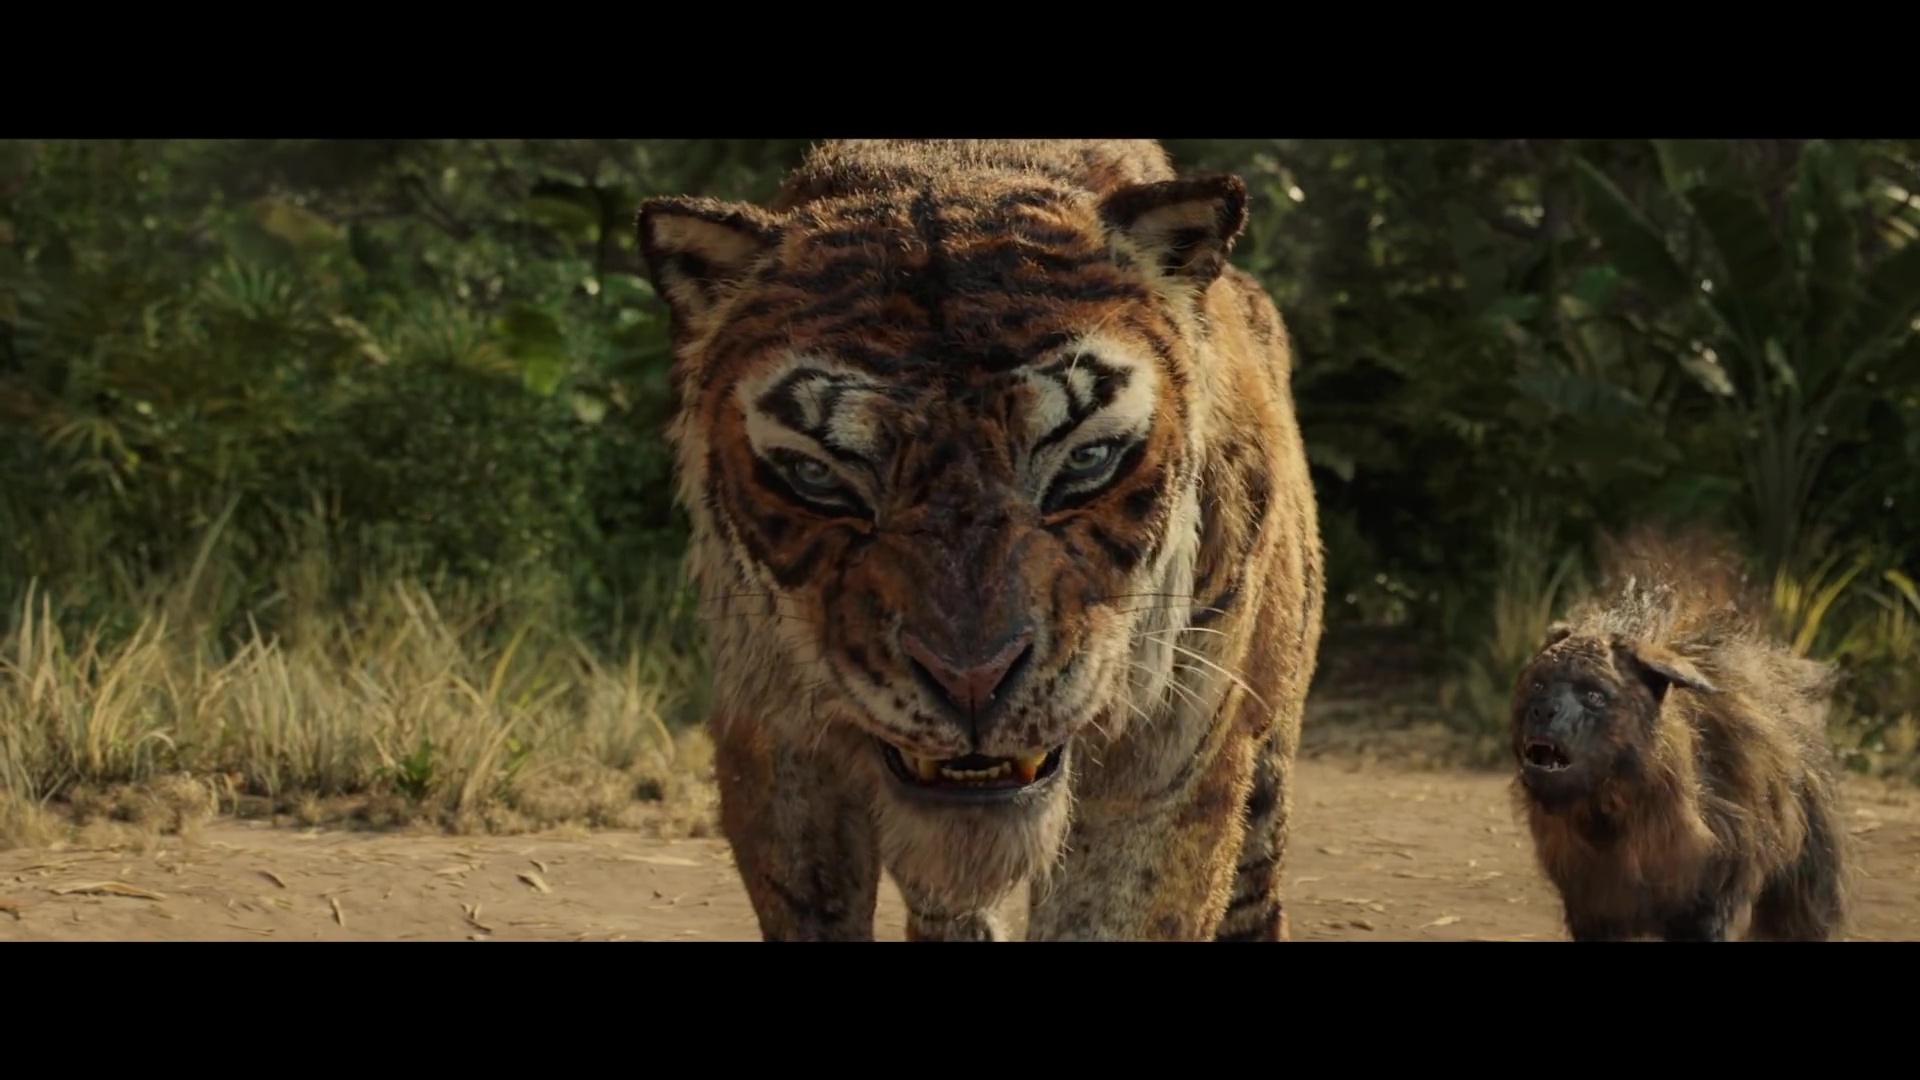 Jungle Book vs Mowgli khan_mowgli_